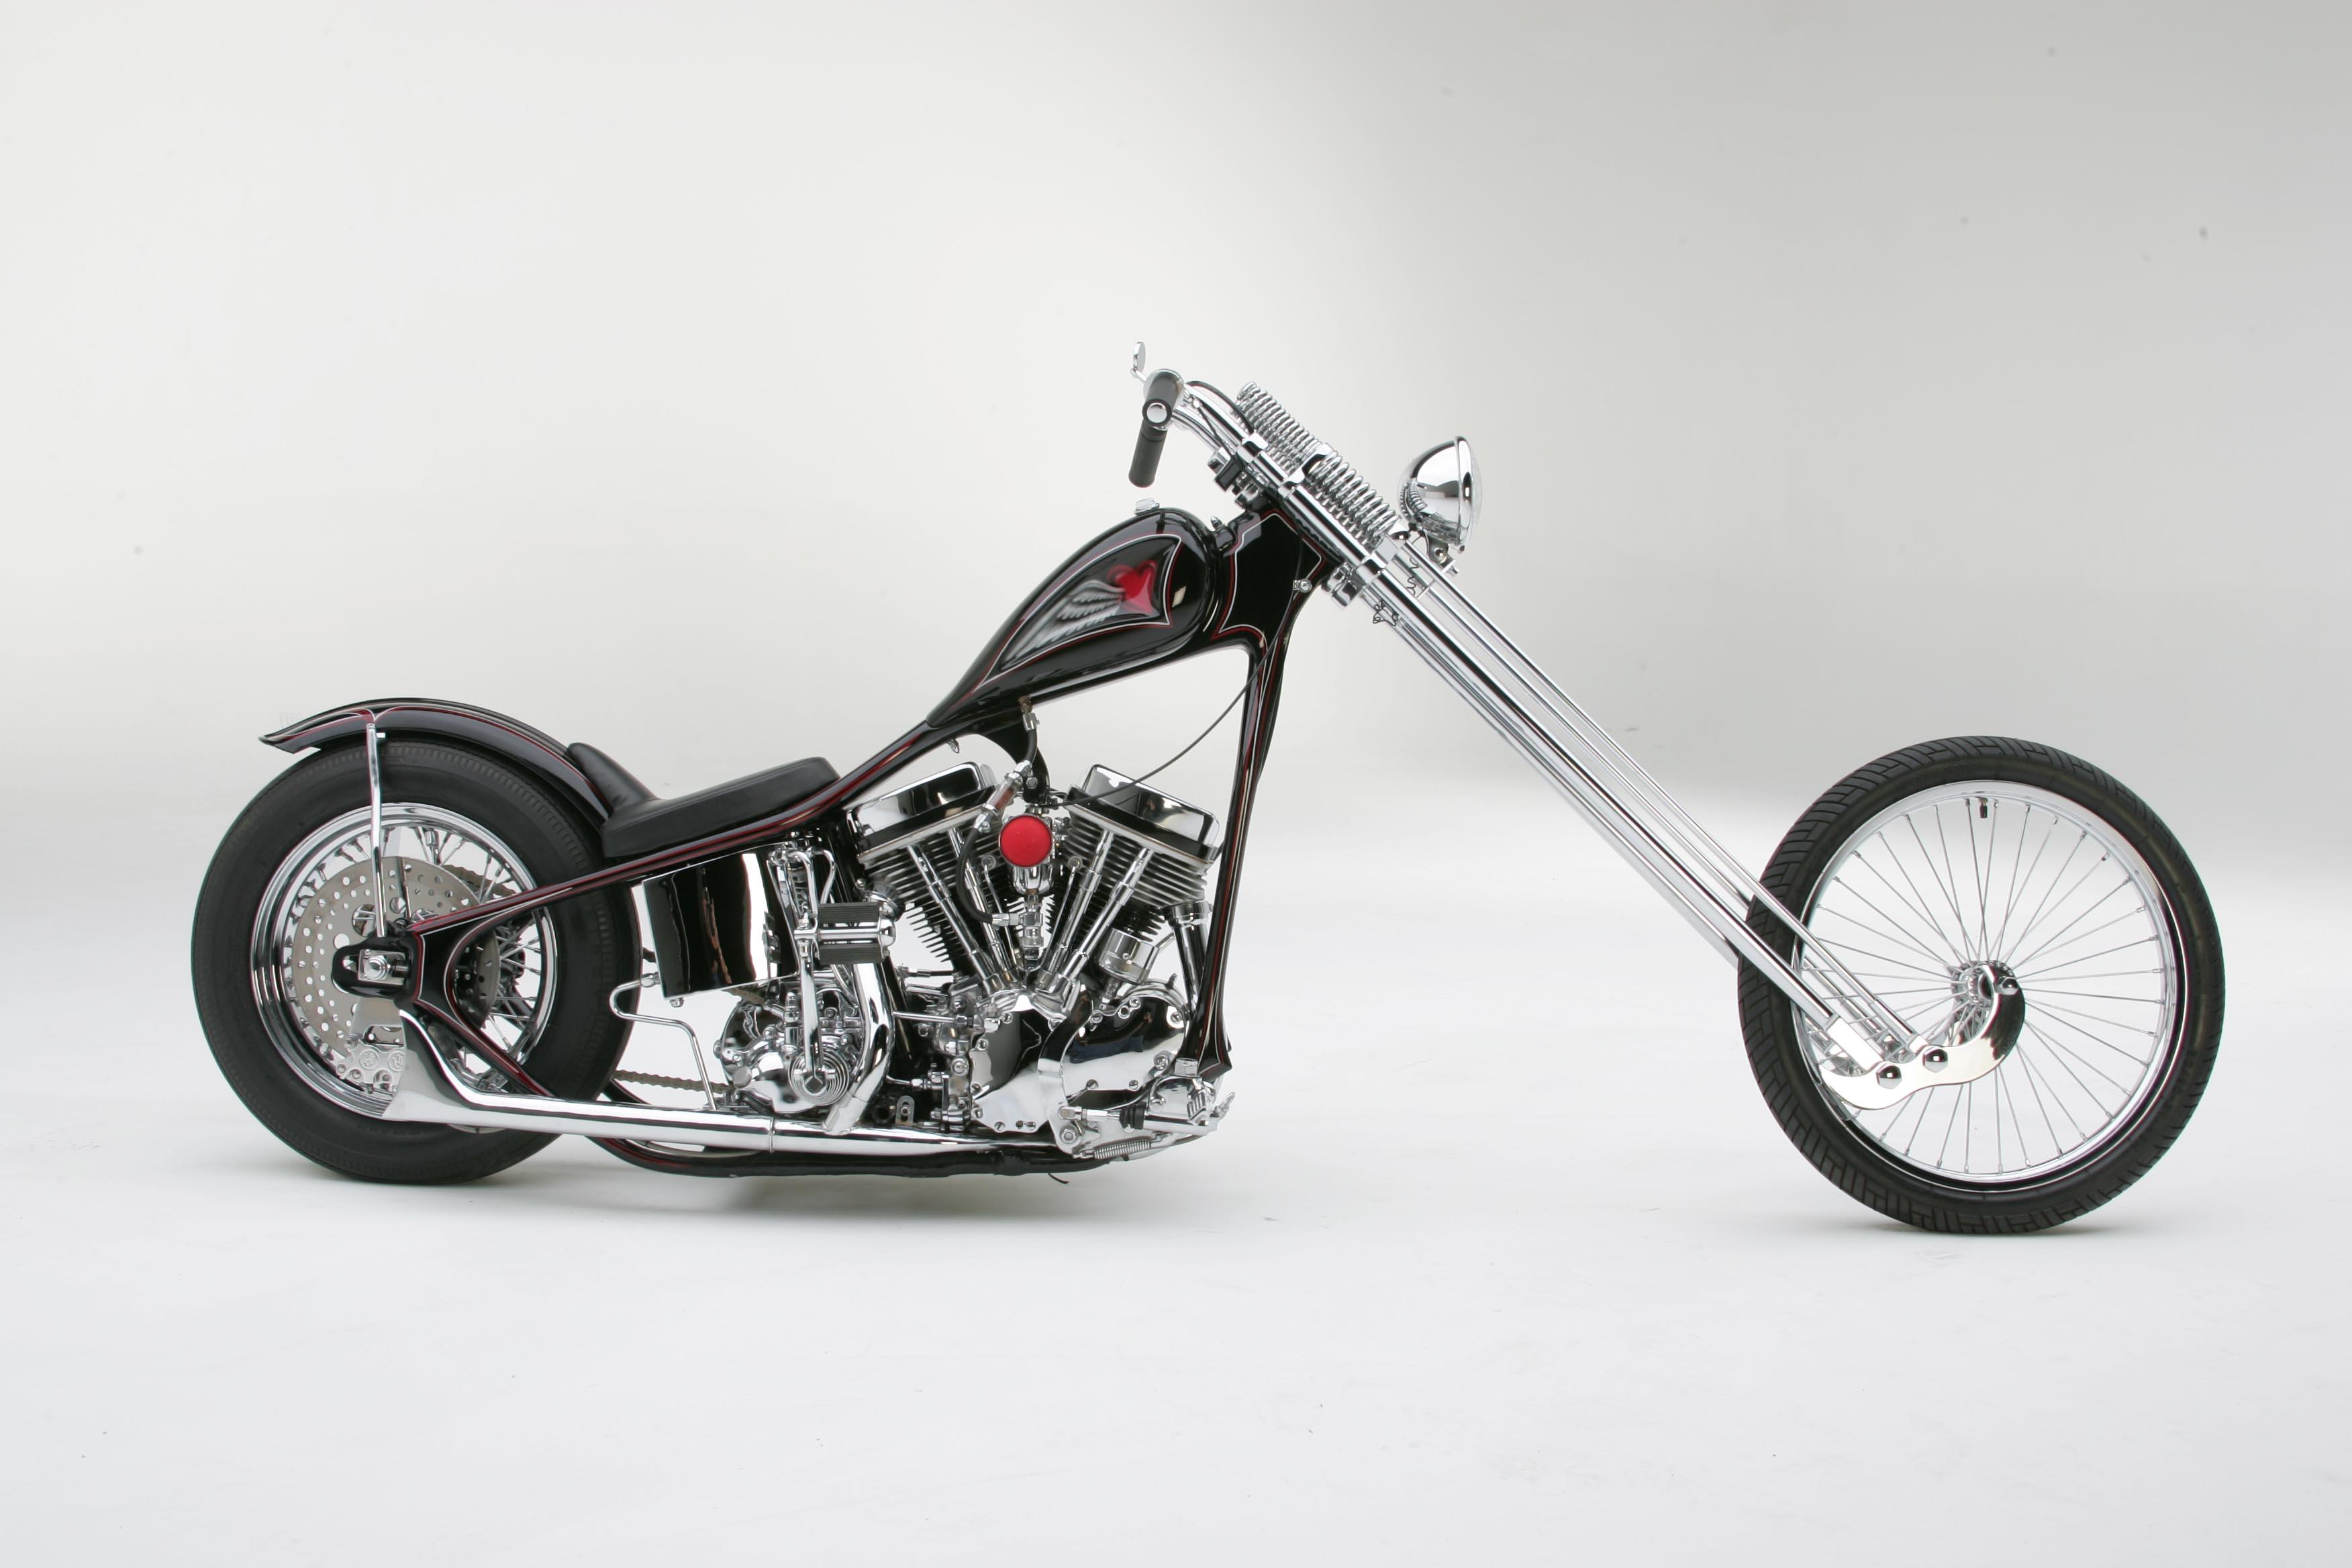 Harley Davidson Chopper Wallpaper HD wallpaper background 3504x2336